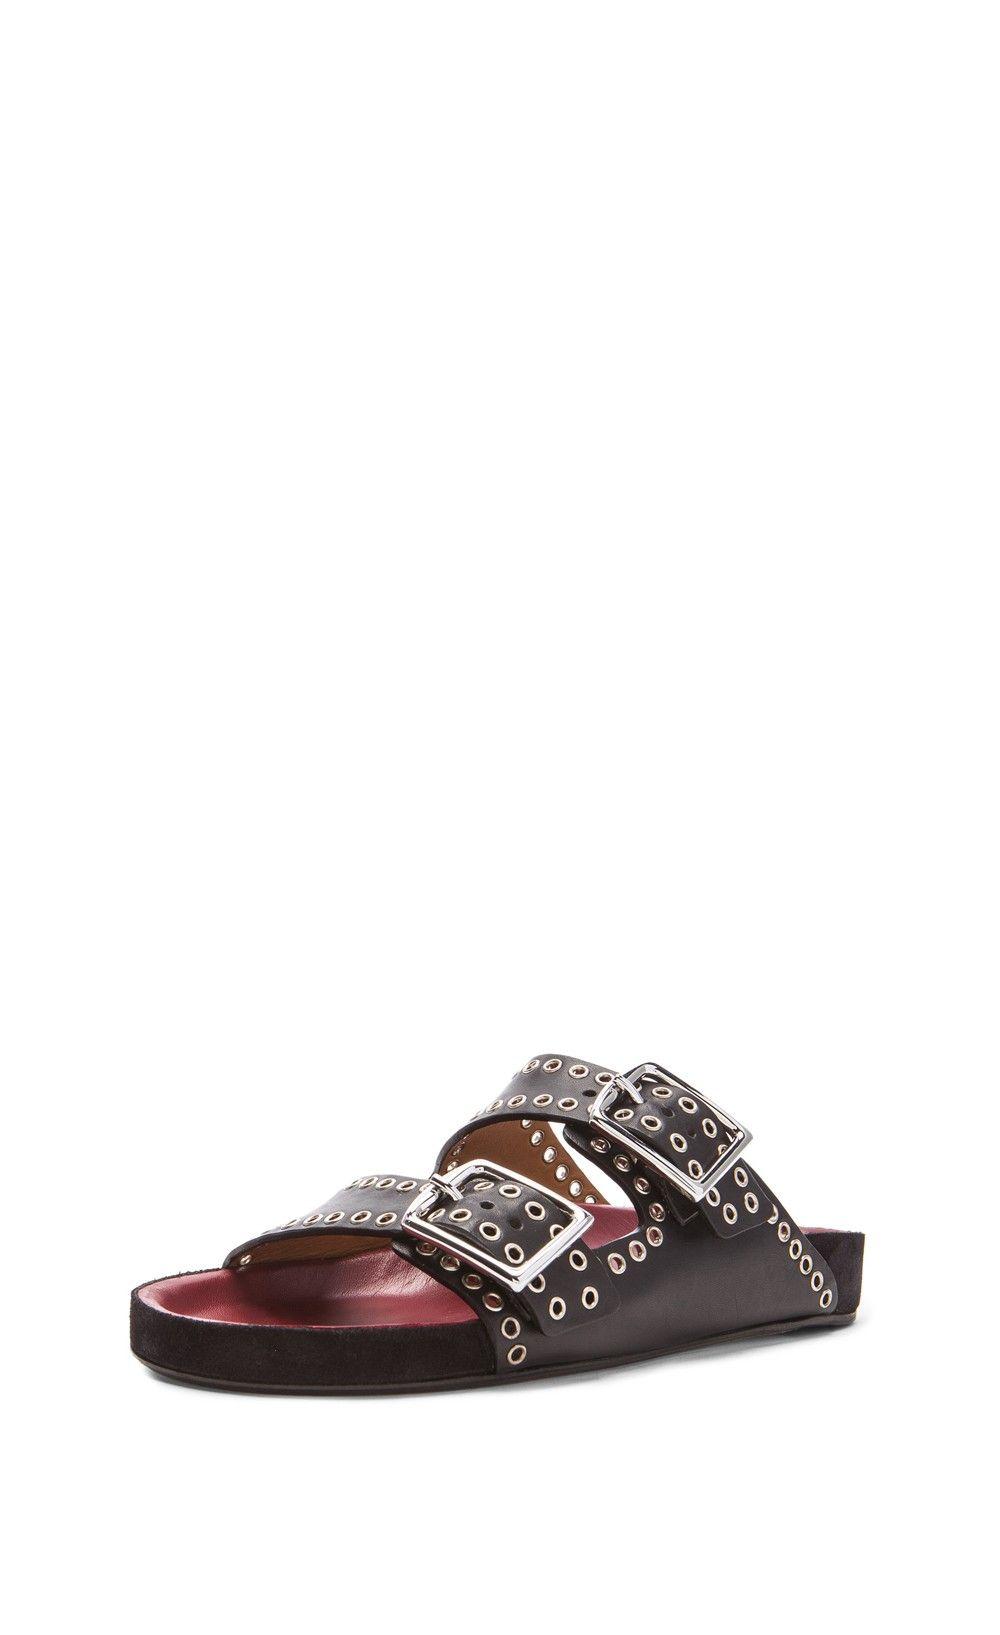 fa142bbeb8ea Isabel marant lenny eyelet calfskin leather sandals black isabel marant jpg  1000x1635 Isabel marant leather sandals